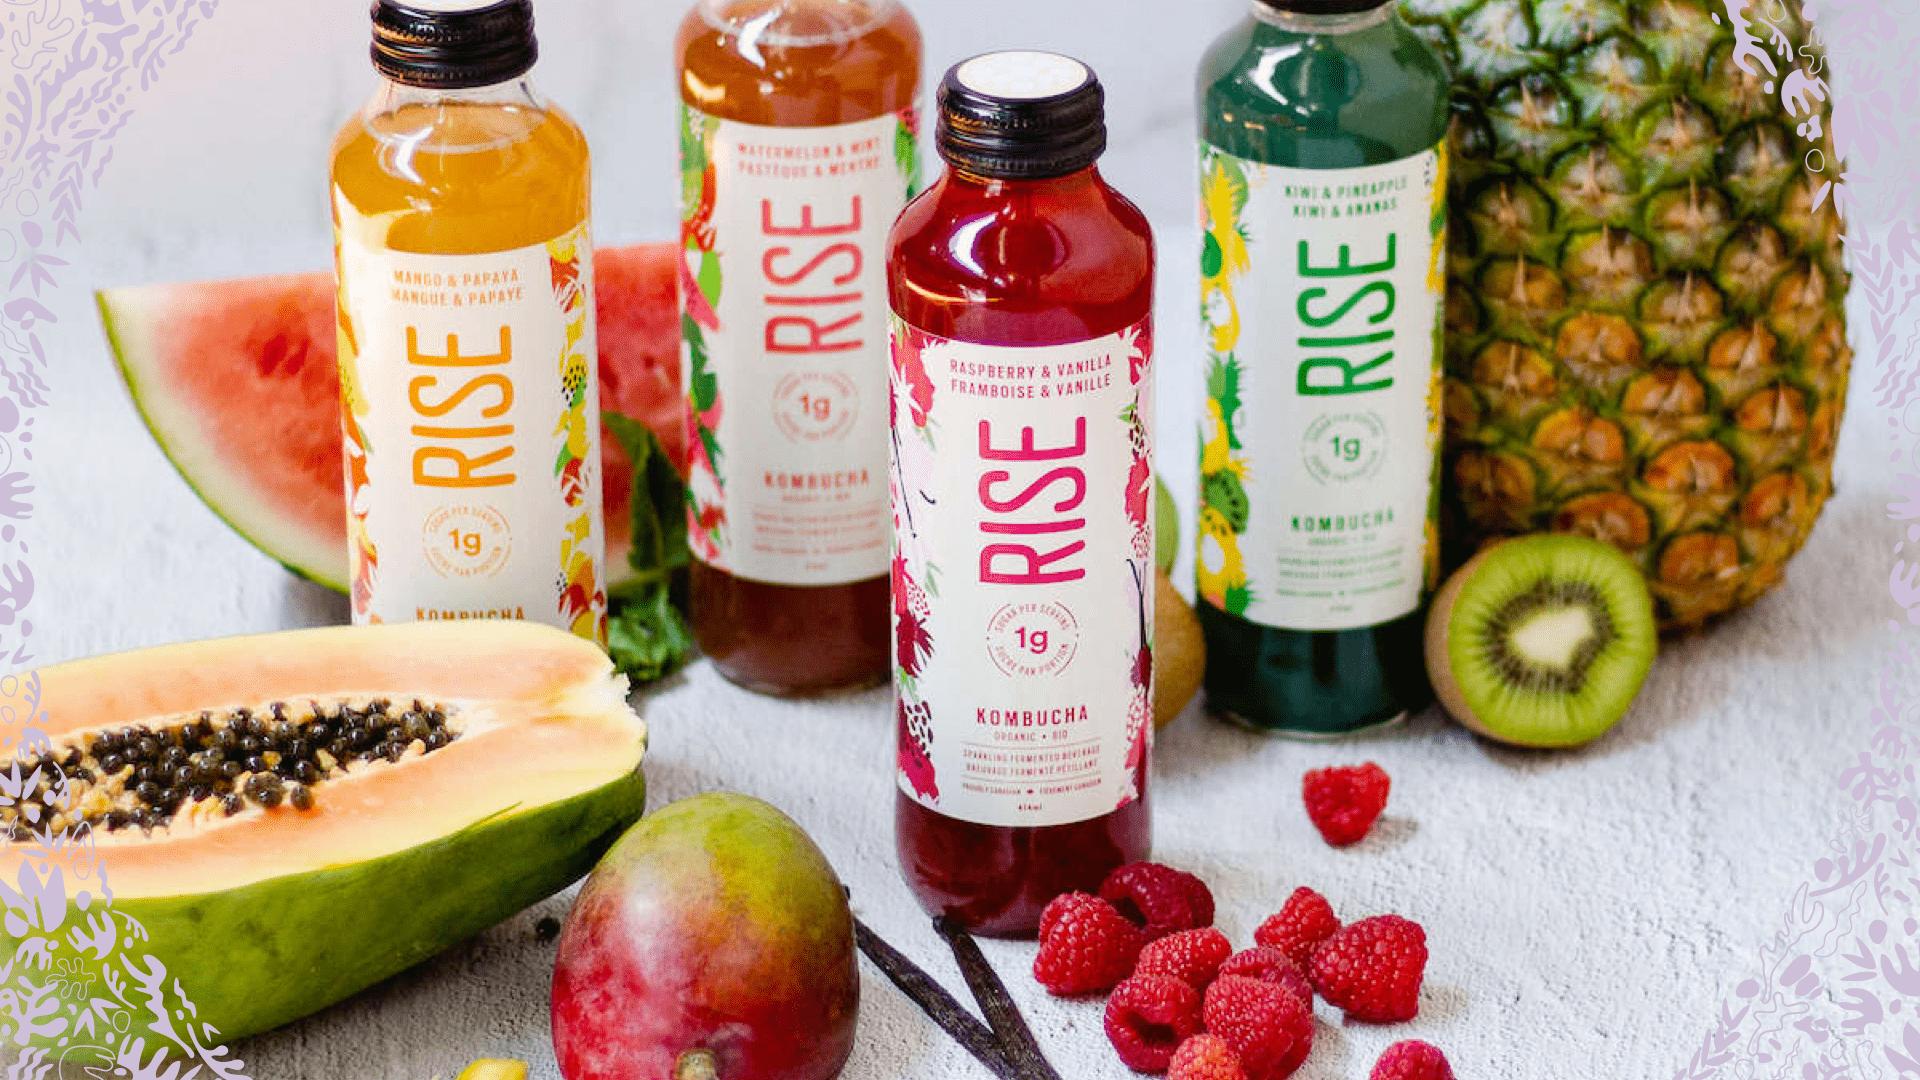 RISE kombucha bottles surrounded by various fruits